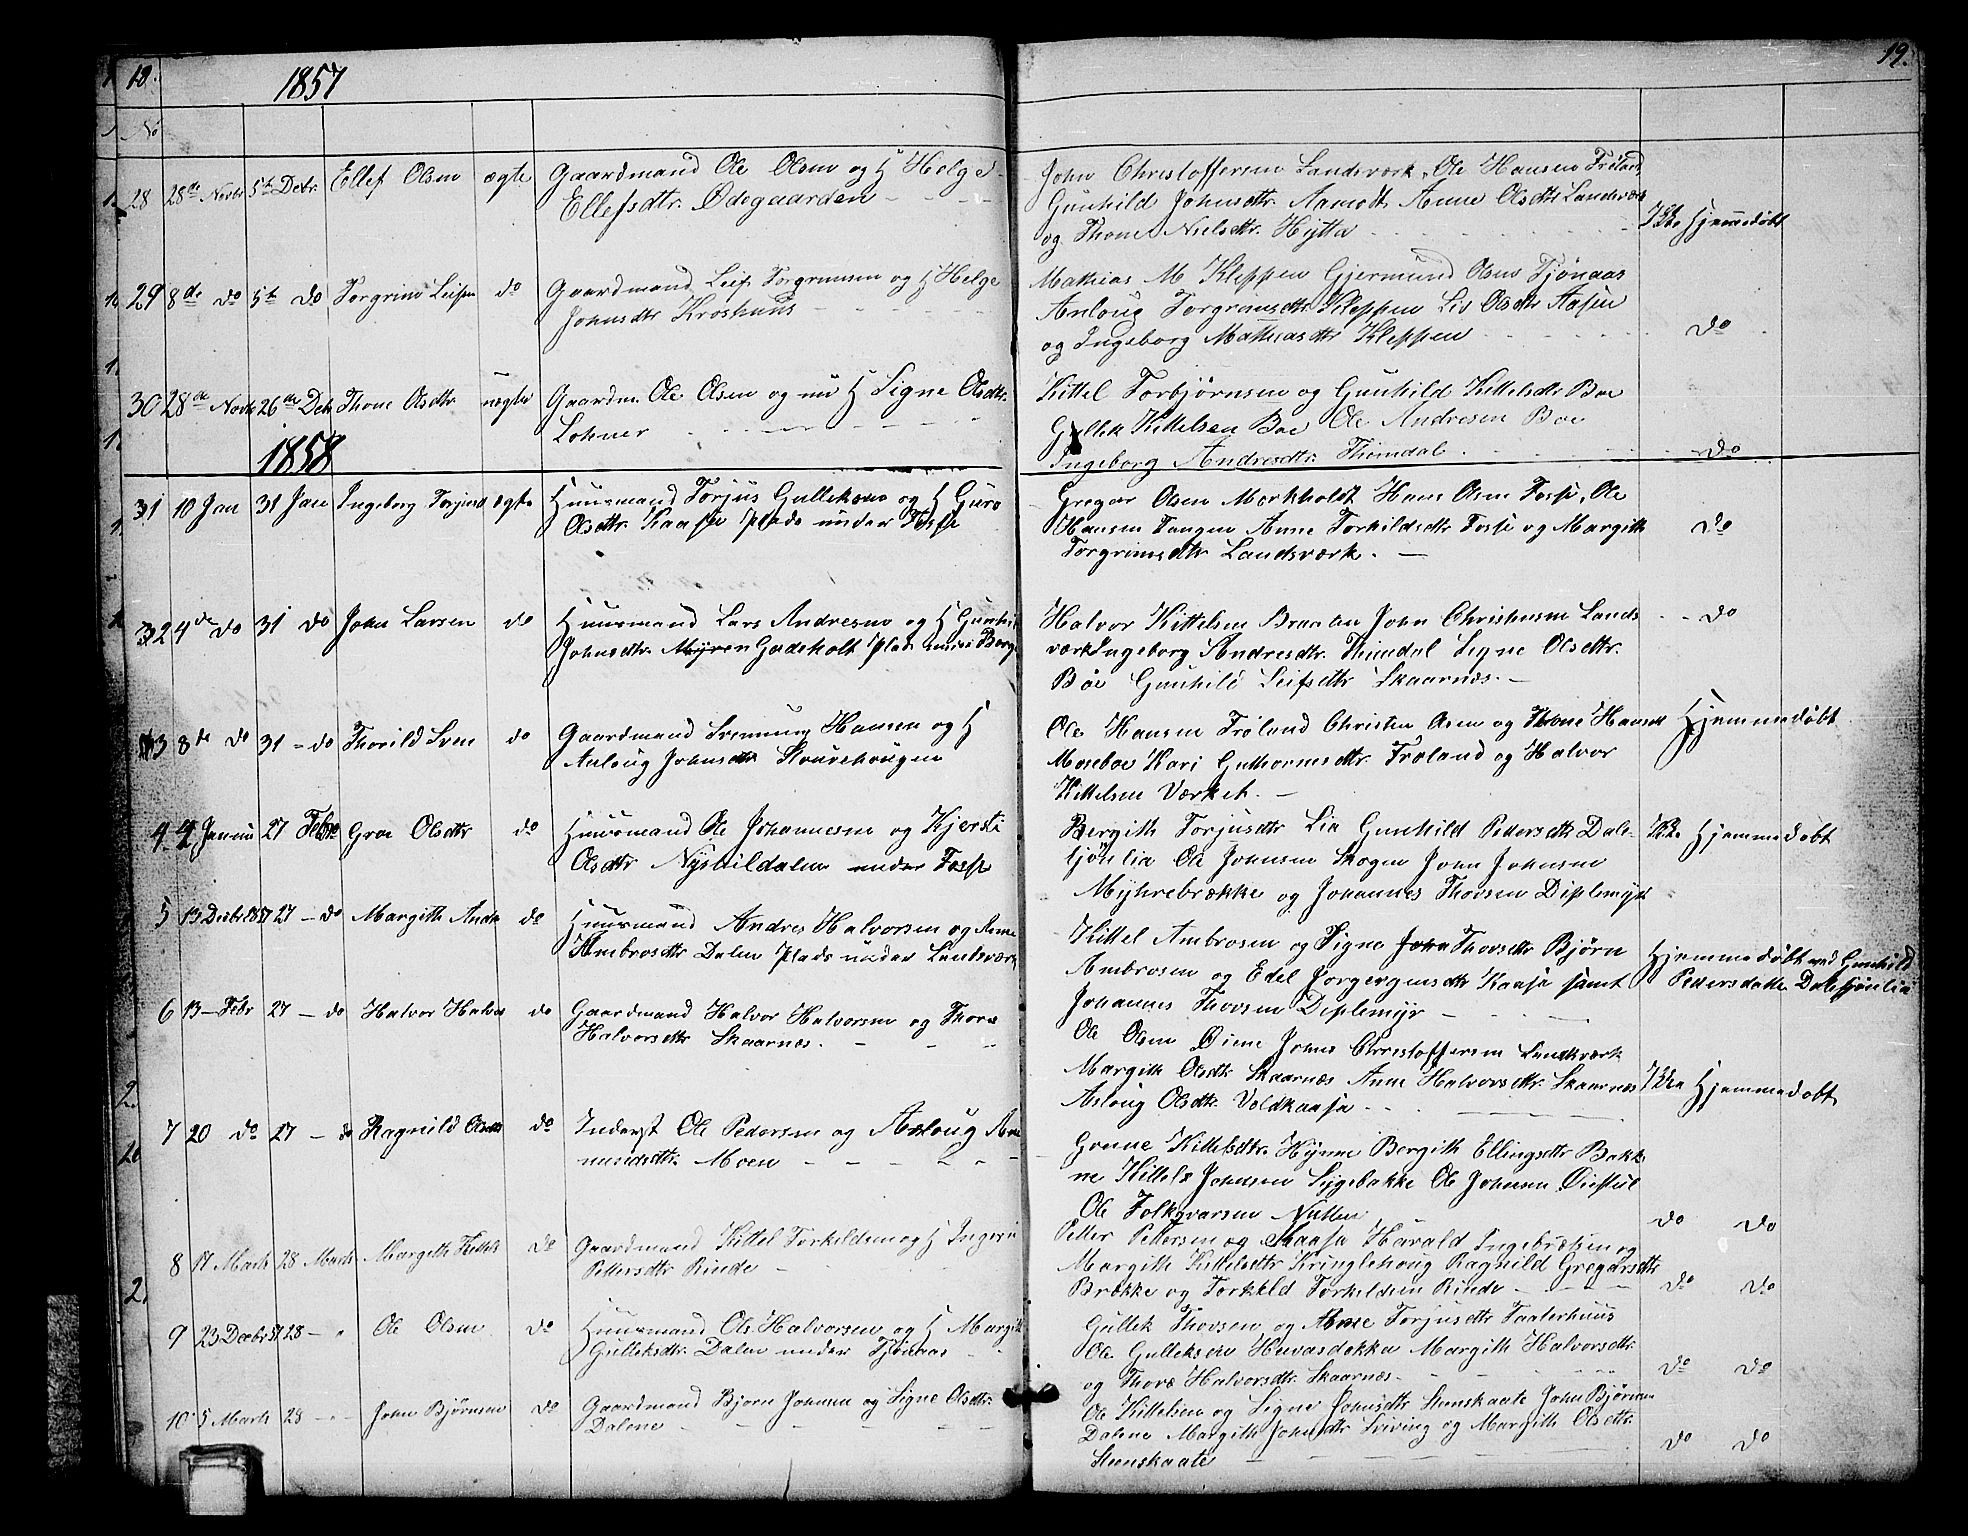 SAKO, Hjartdal kirkebøker, G/Gb/L0002: Klokkerbok nr. II 2, 1854-1884, s. 18-19